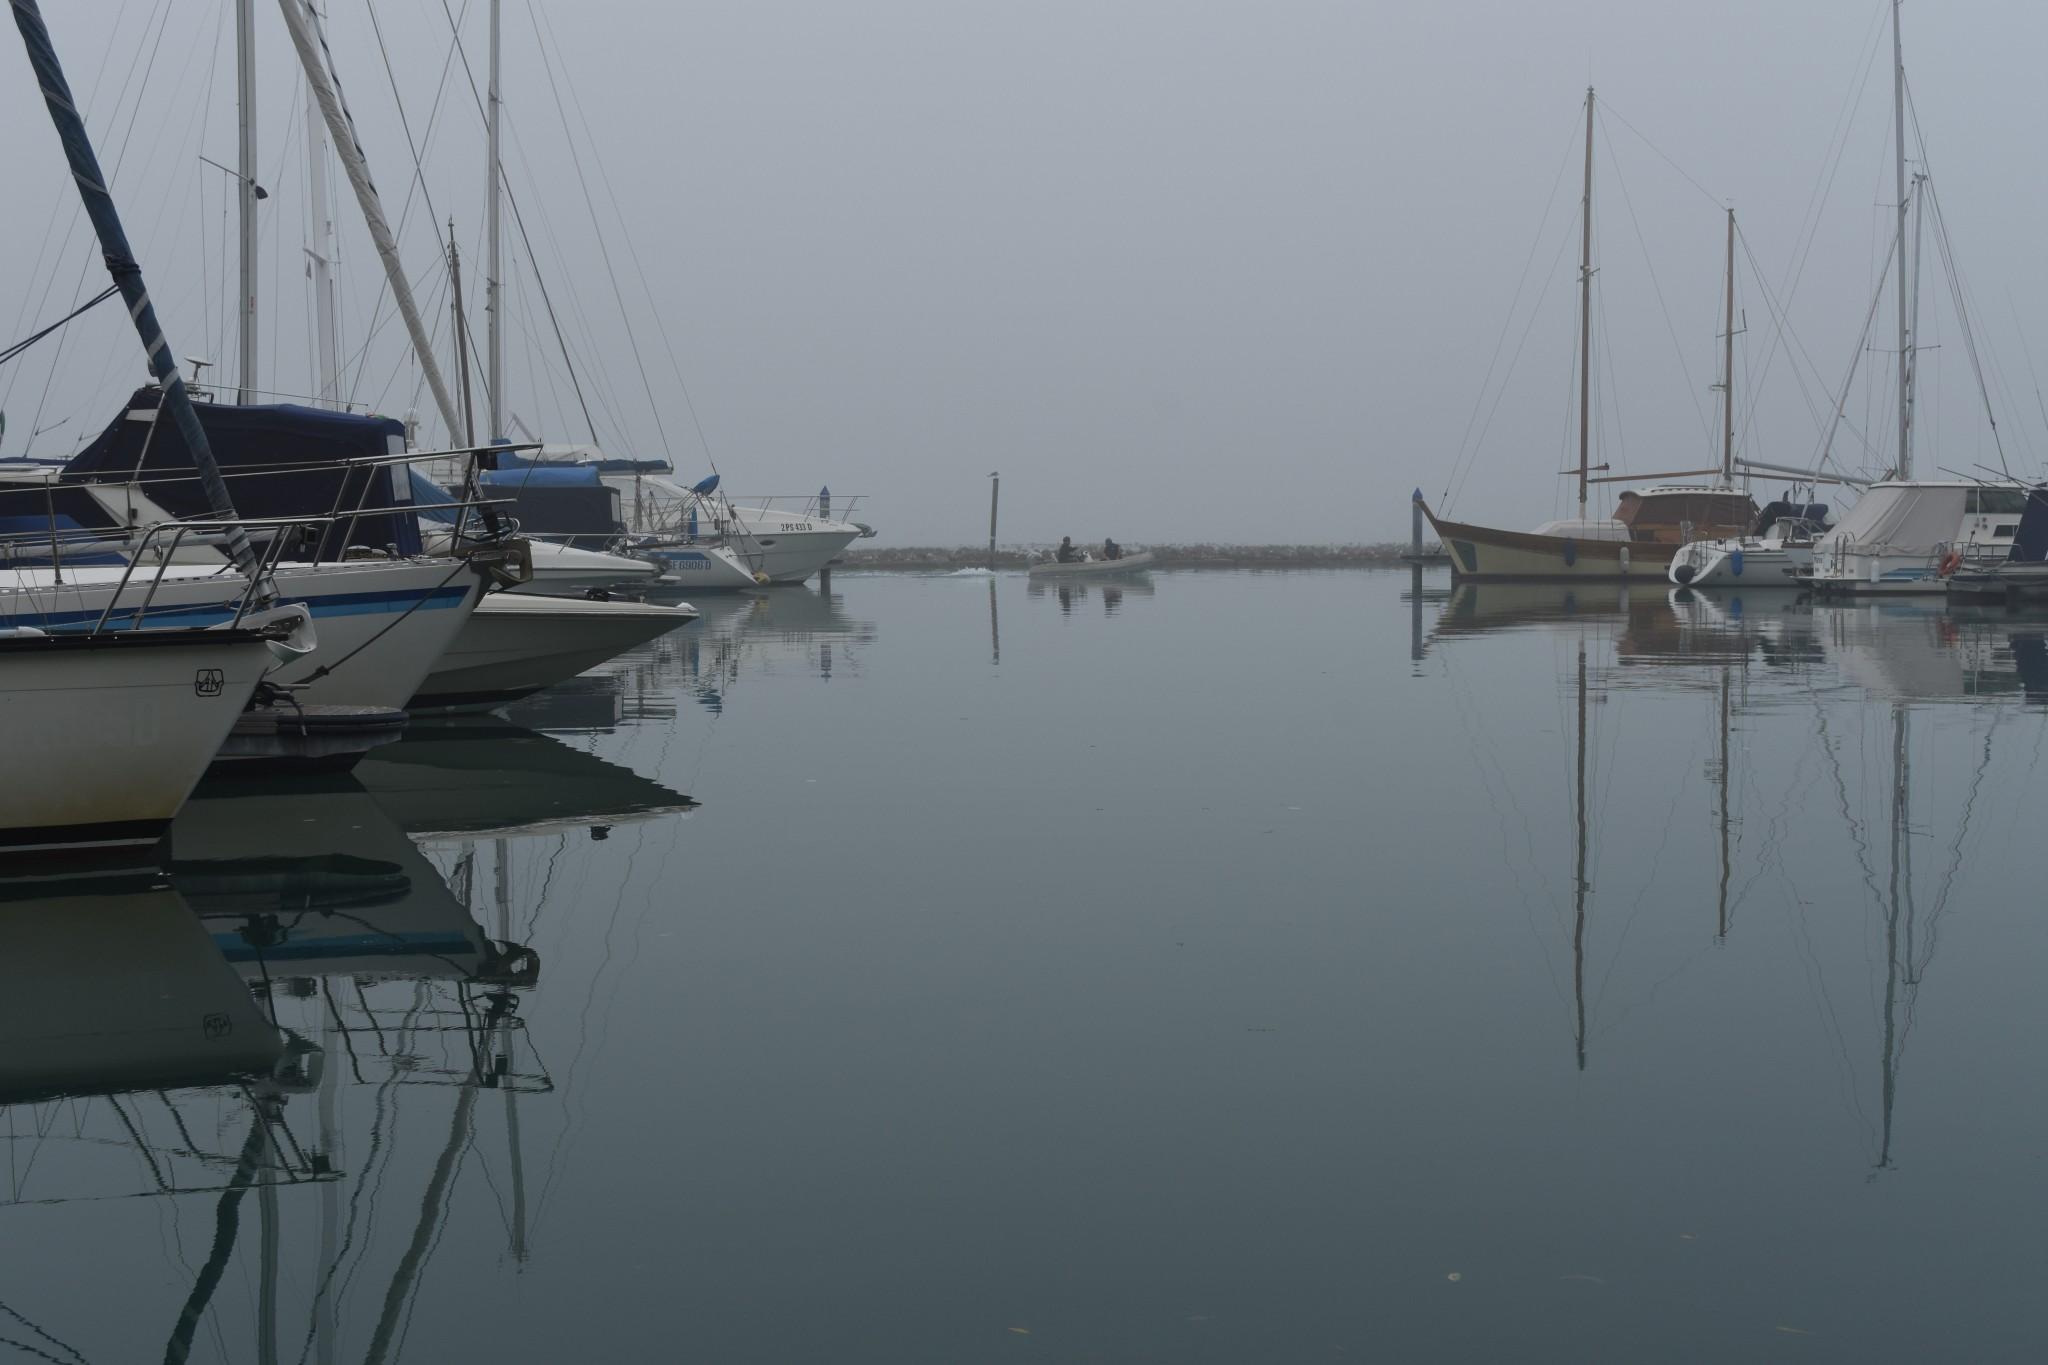 Misty day on the Certosa island